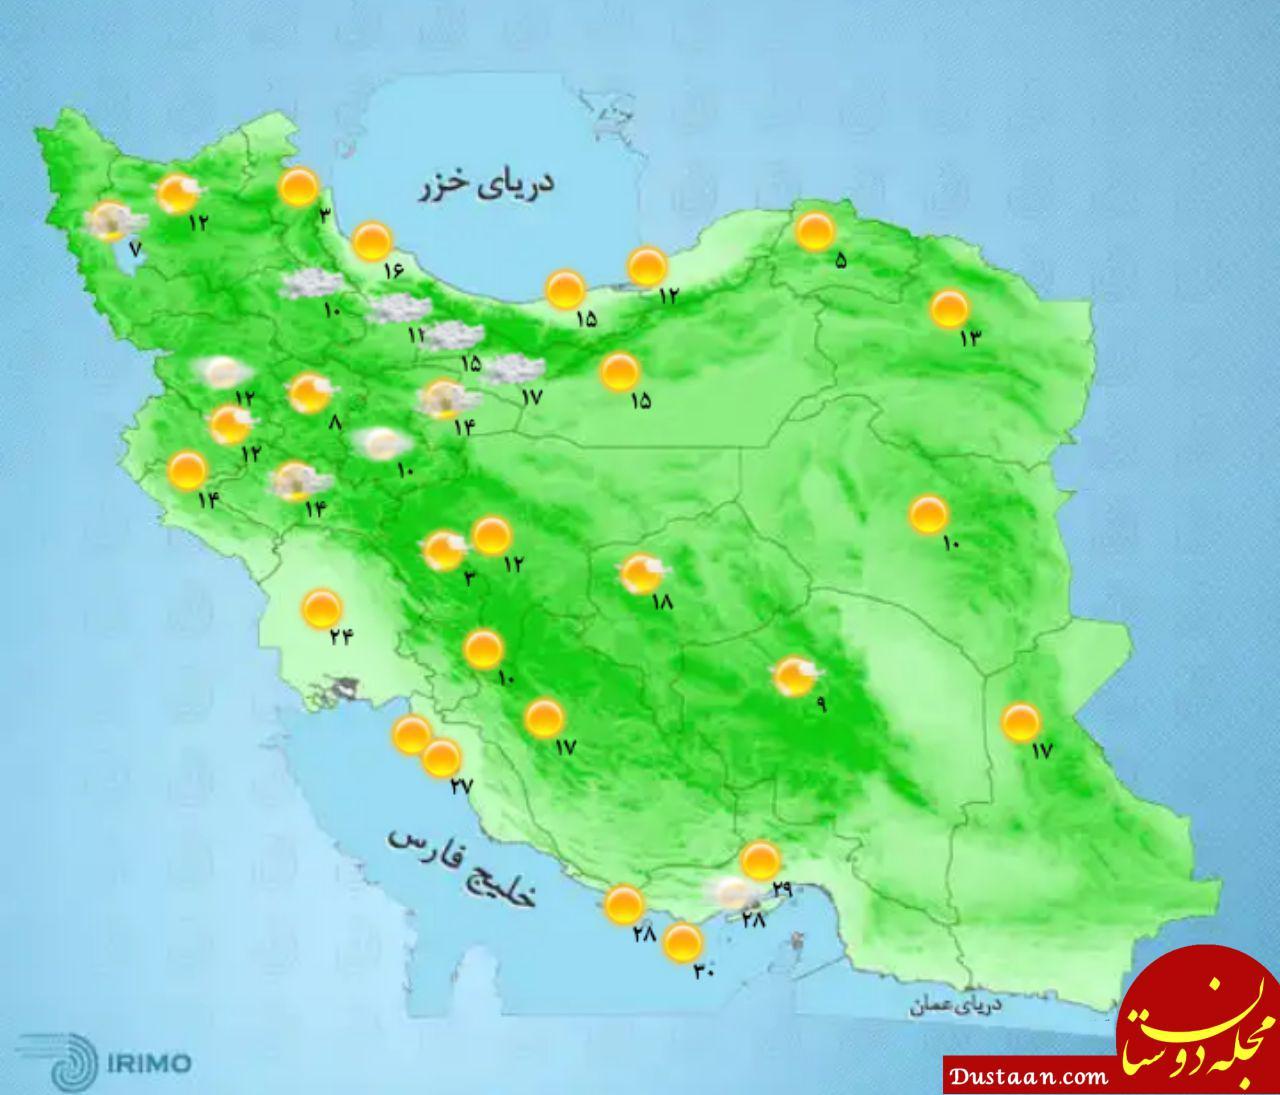 www.dustaan.com وضعیت آب و هوای استان های کشور / شنبه 28 مهر